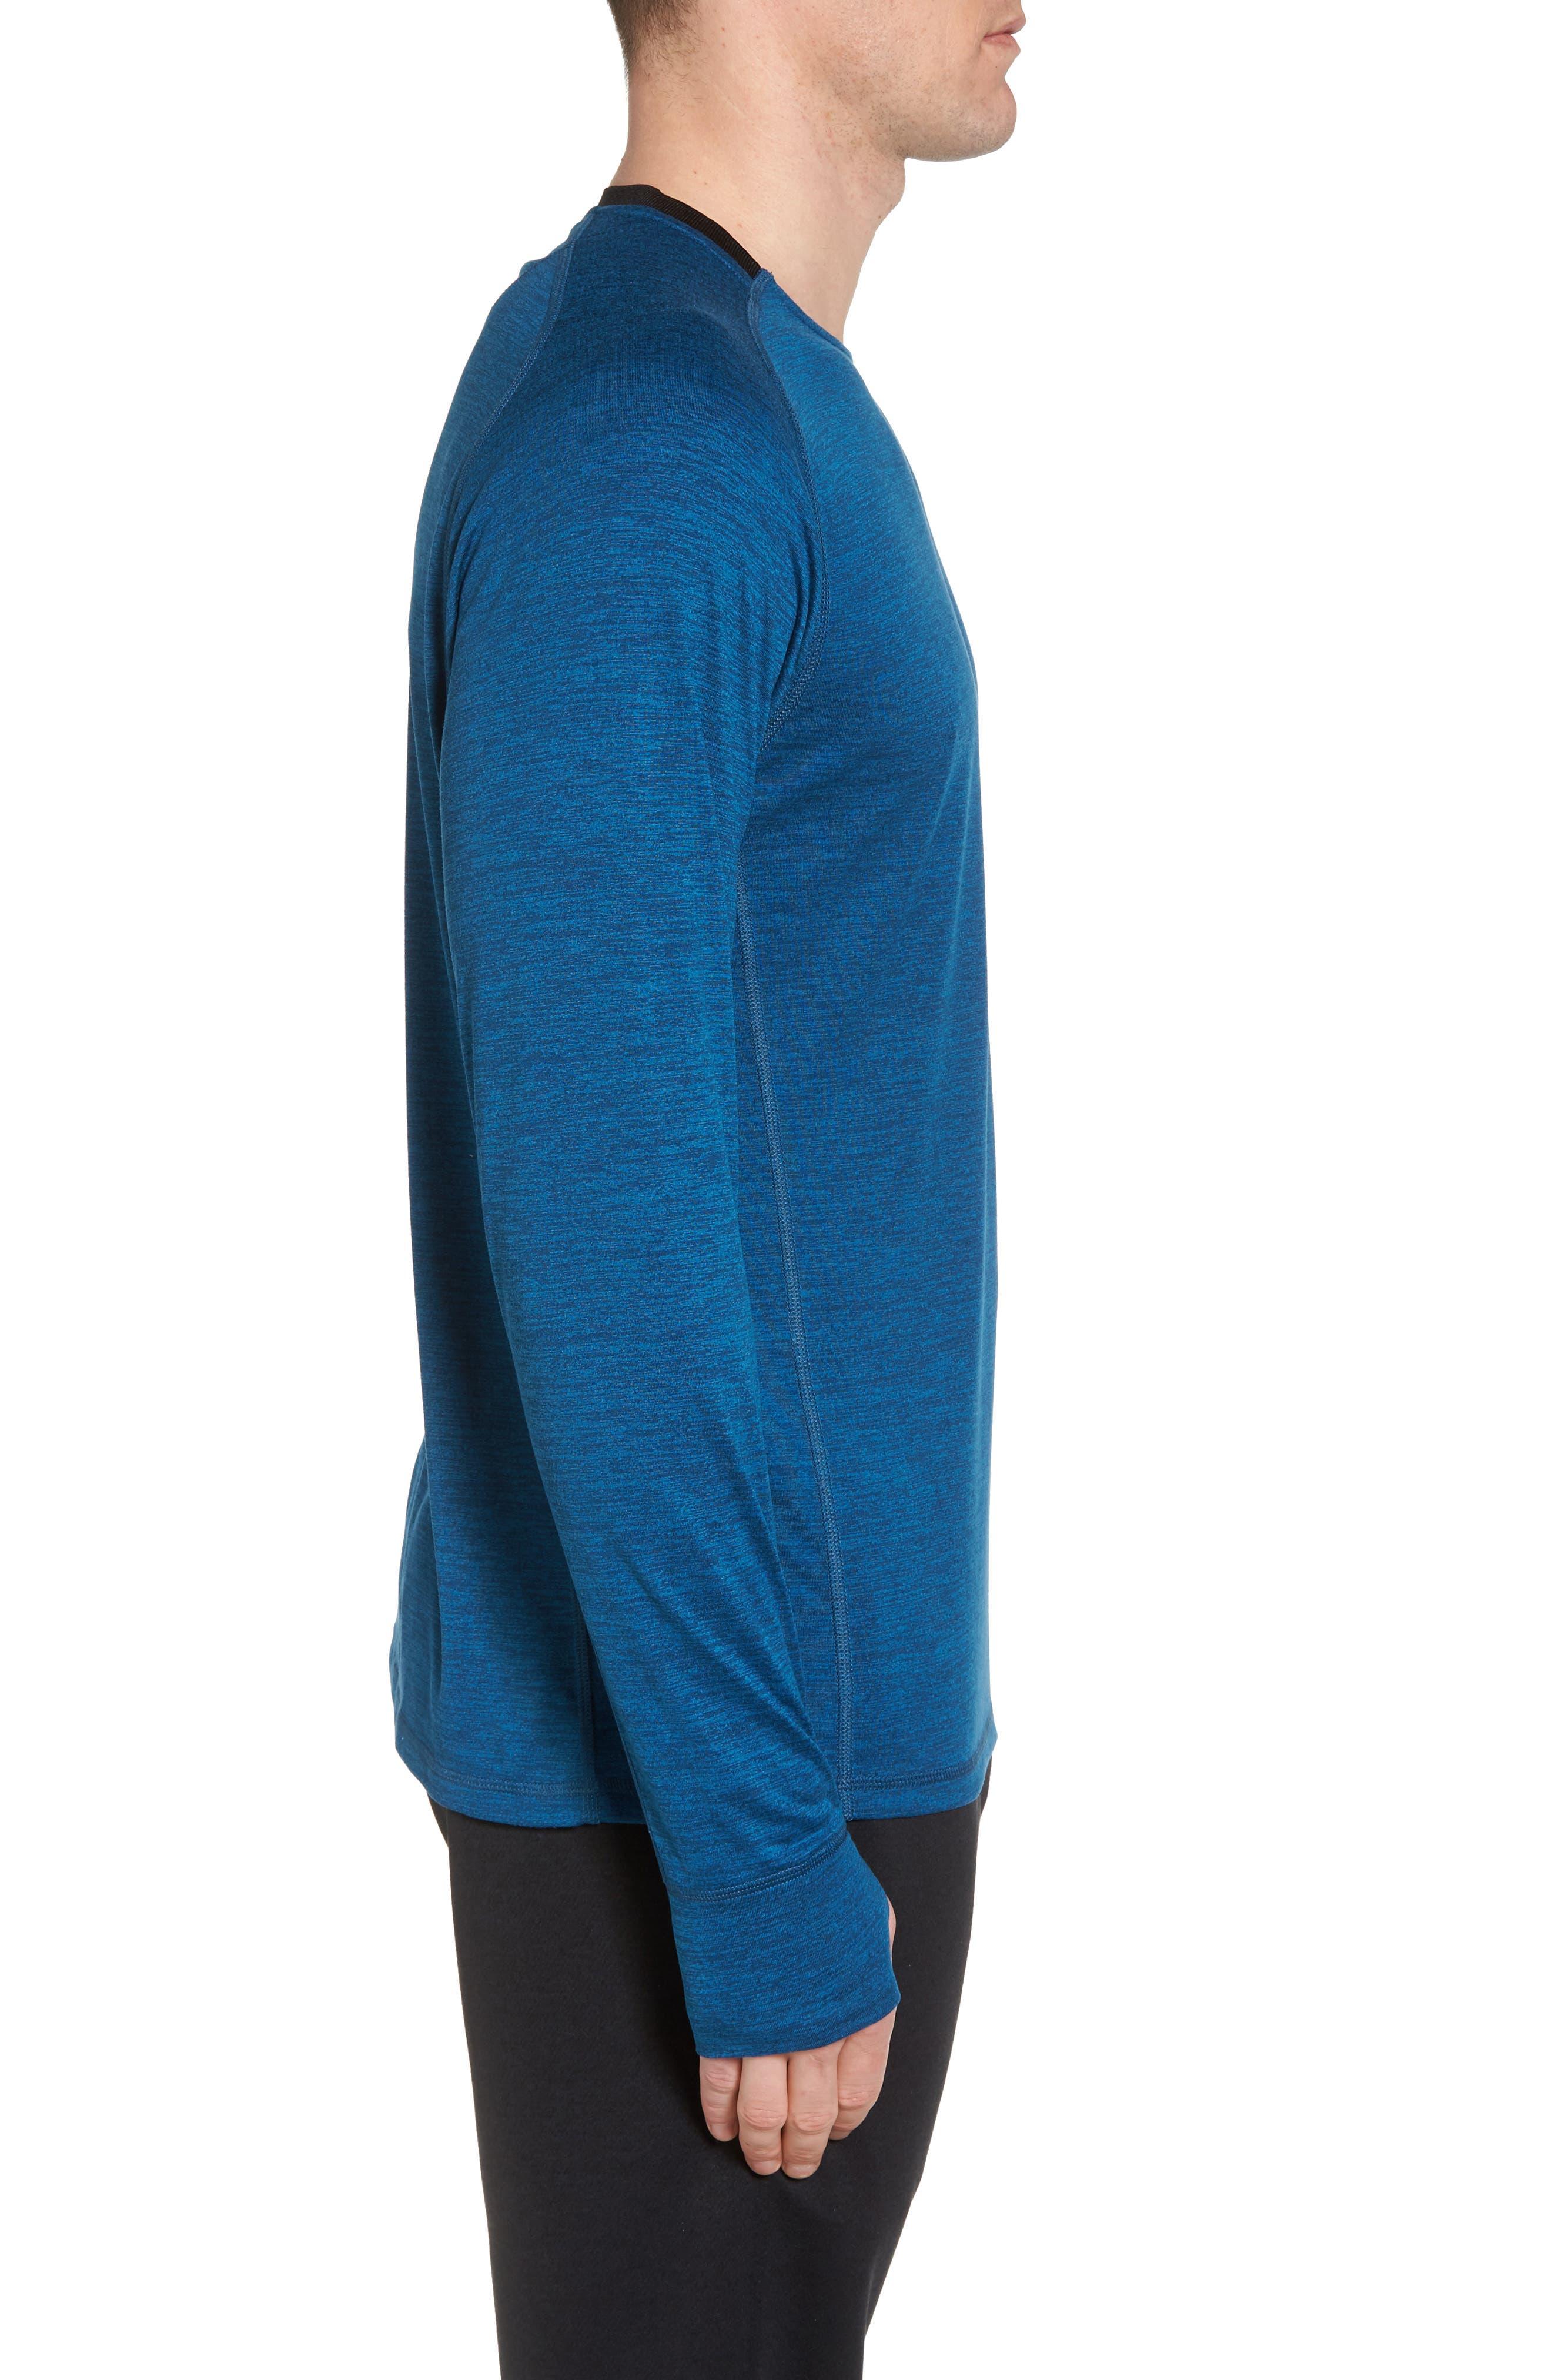 Larosite Athletic Fit T-Shirt,                             Alternate thumbnail 3, color,                             Blue Iolite Melange